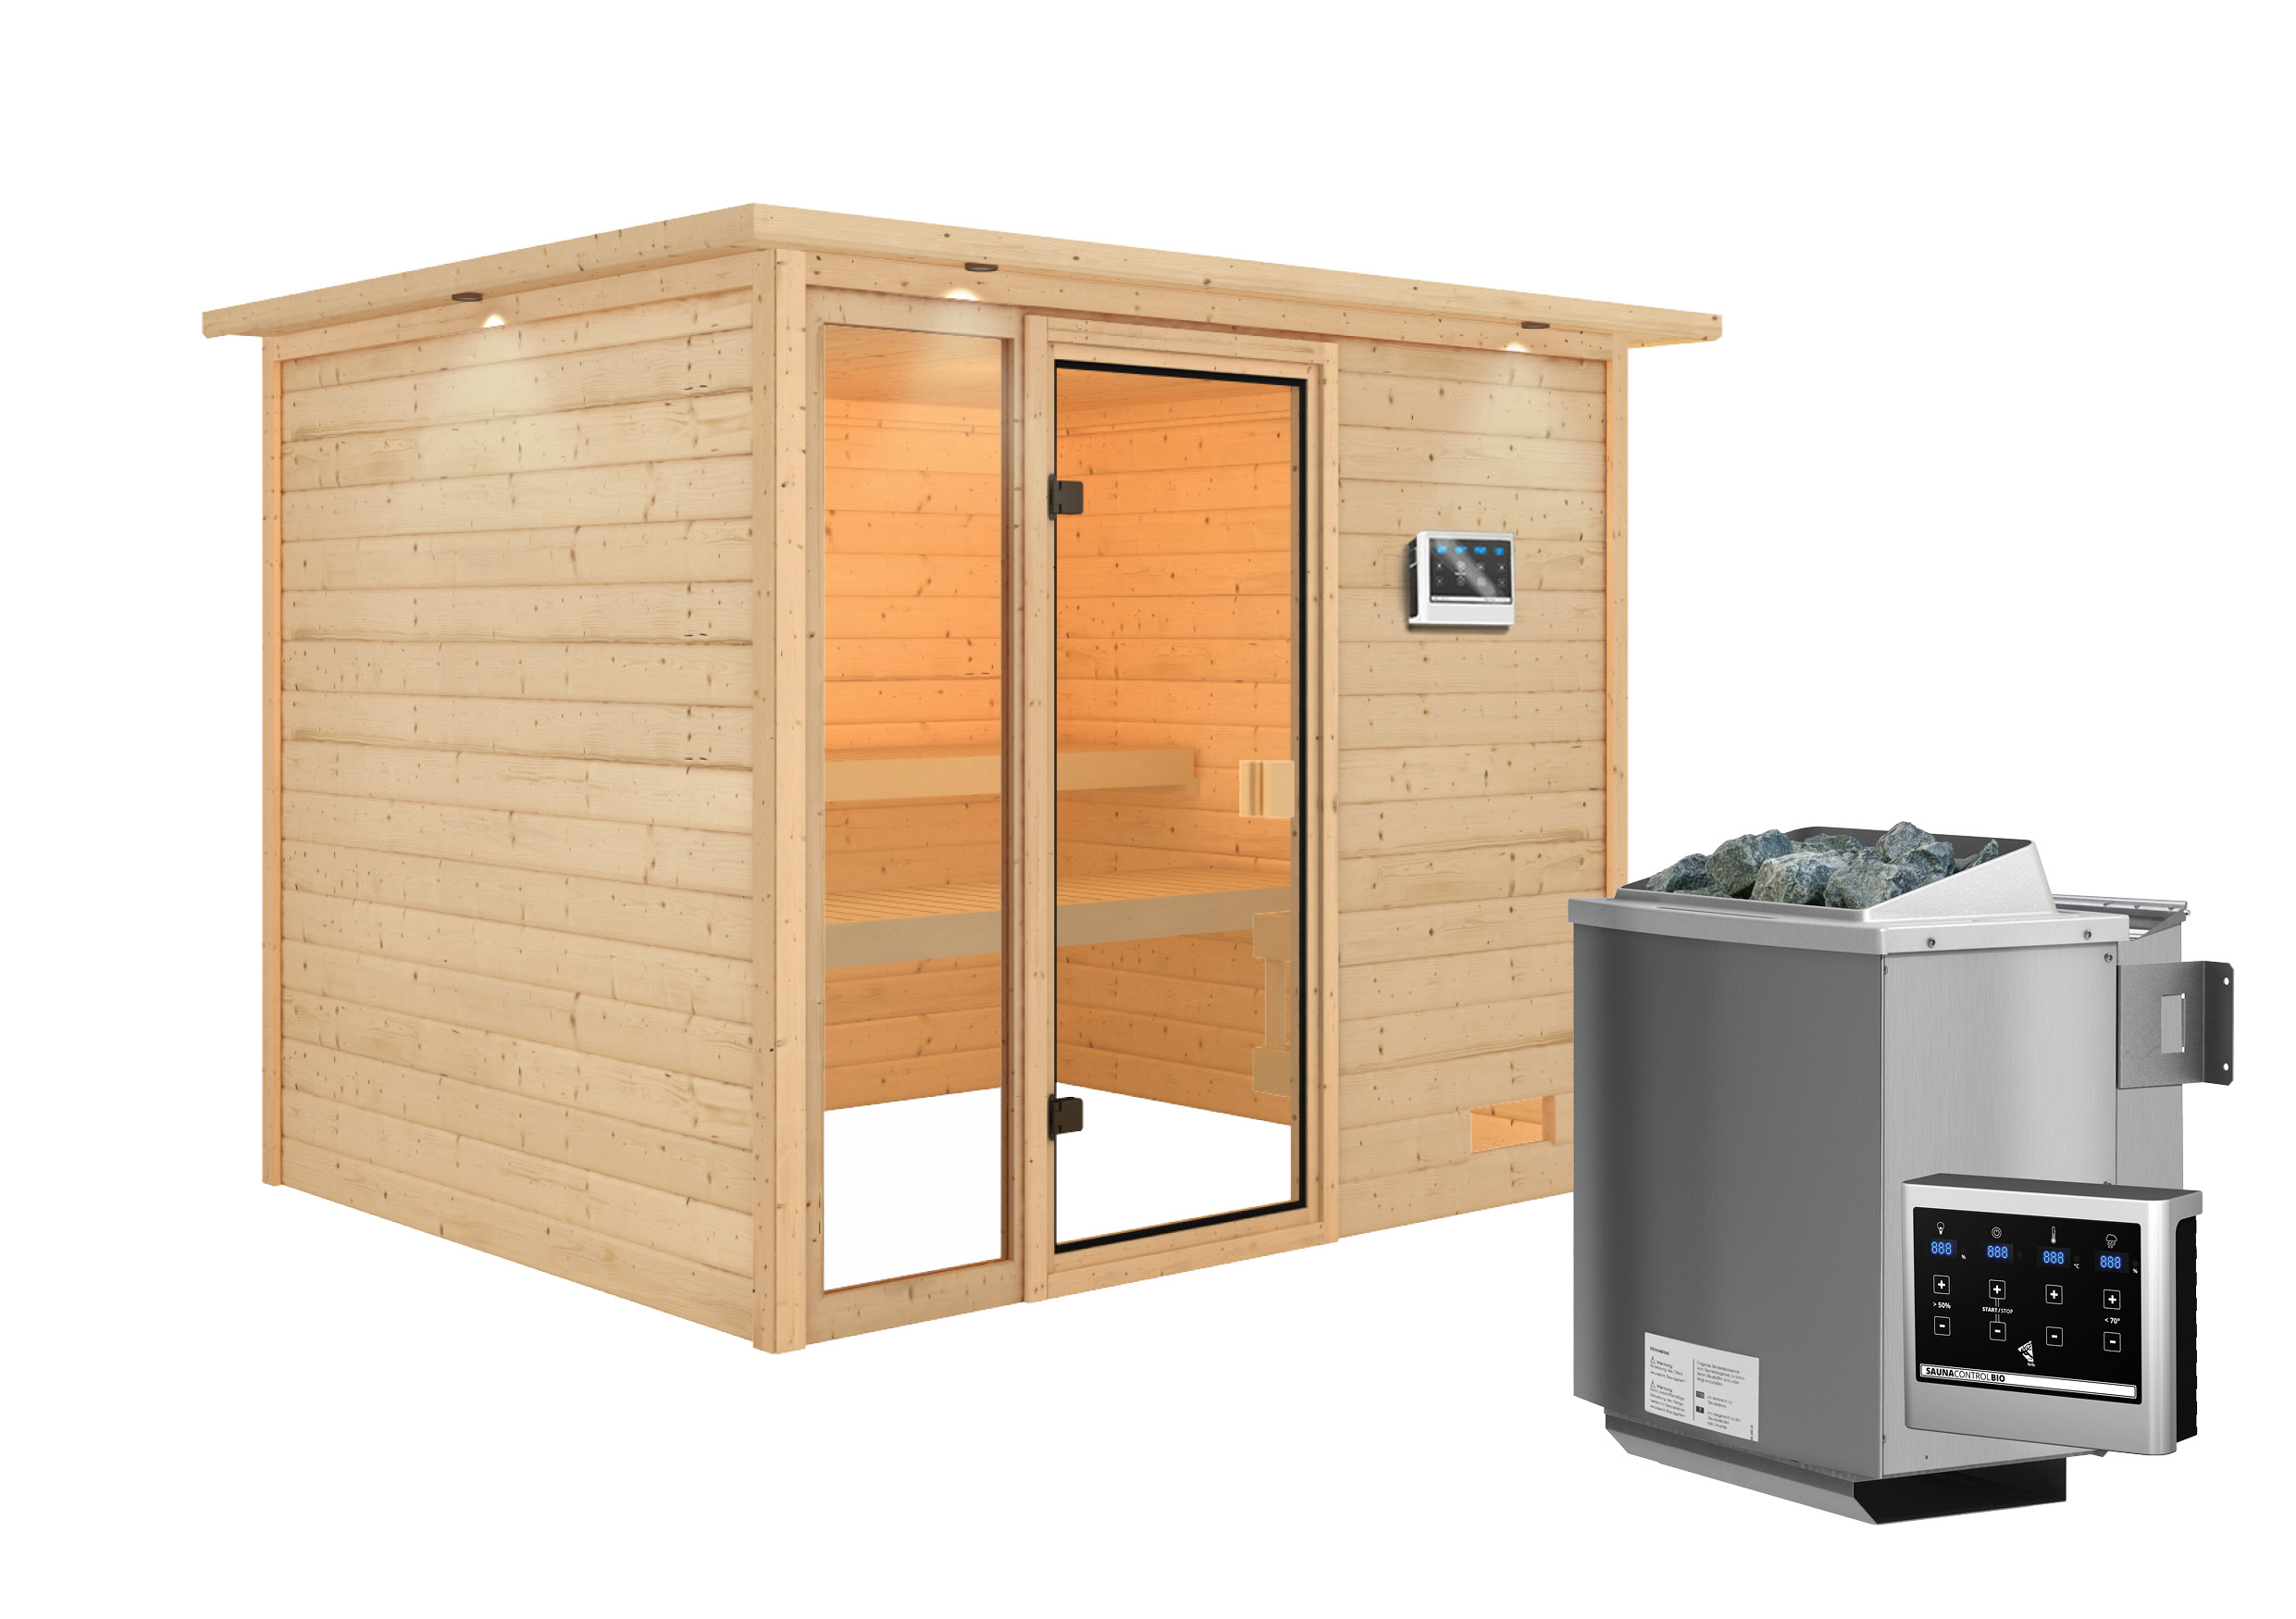 Woodfeeling Sauna Kiana 38mm Dachkranz Bio Saunaofen 9 kW extern Bild 3